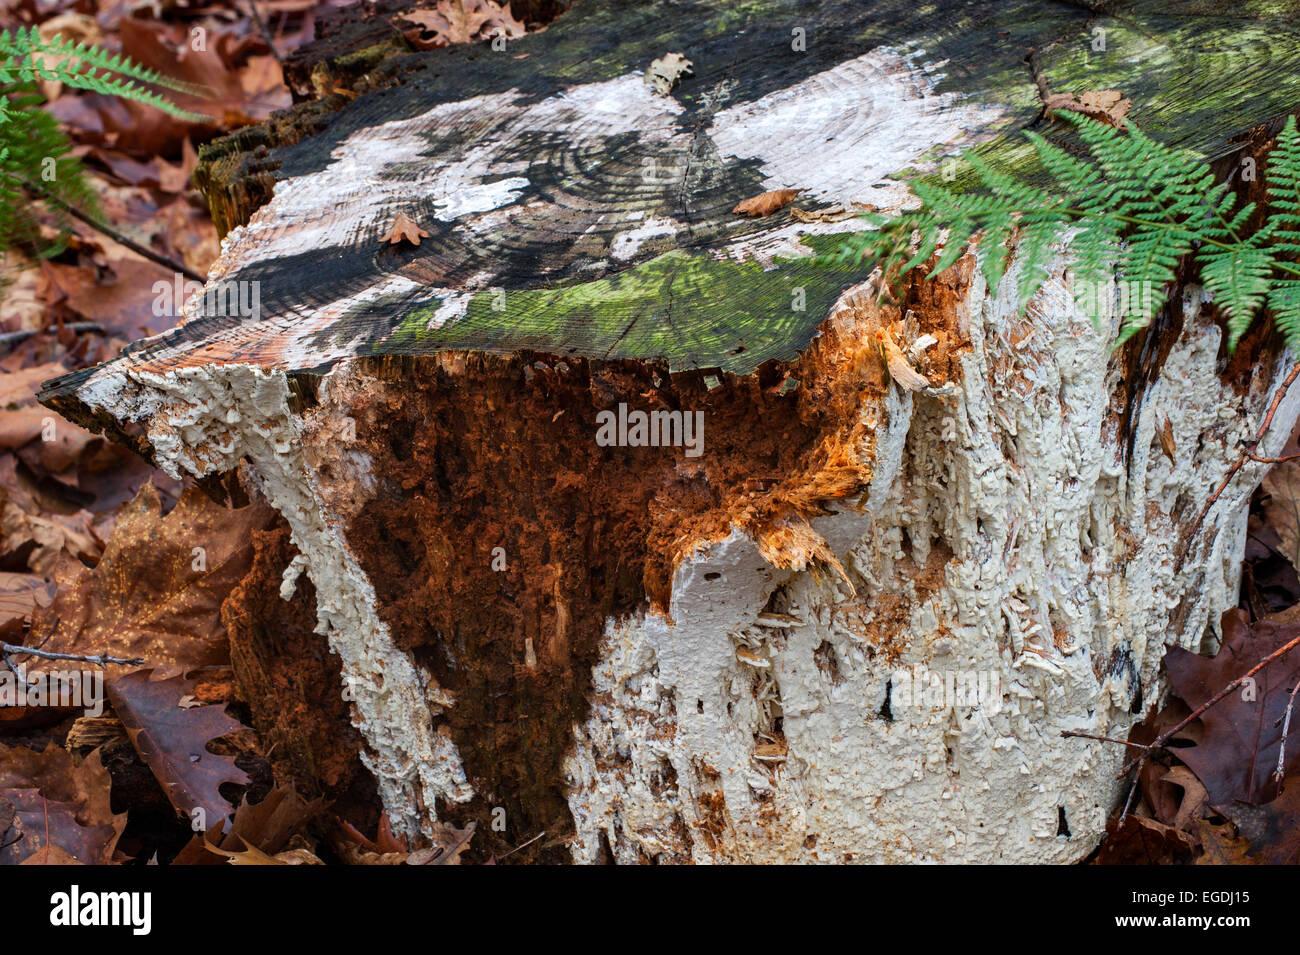 Fungi Antrodia xantha covering tree stump and causing white rot - Stock Image